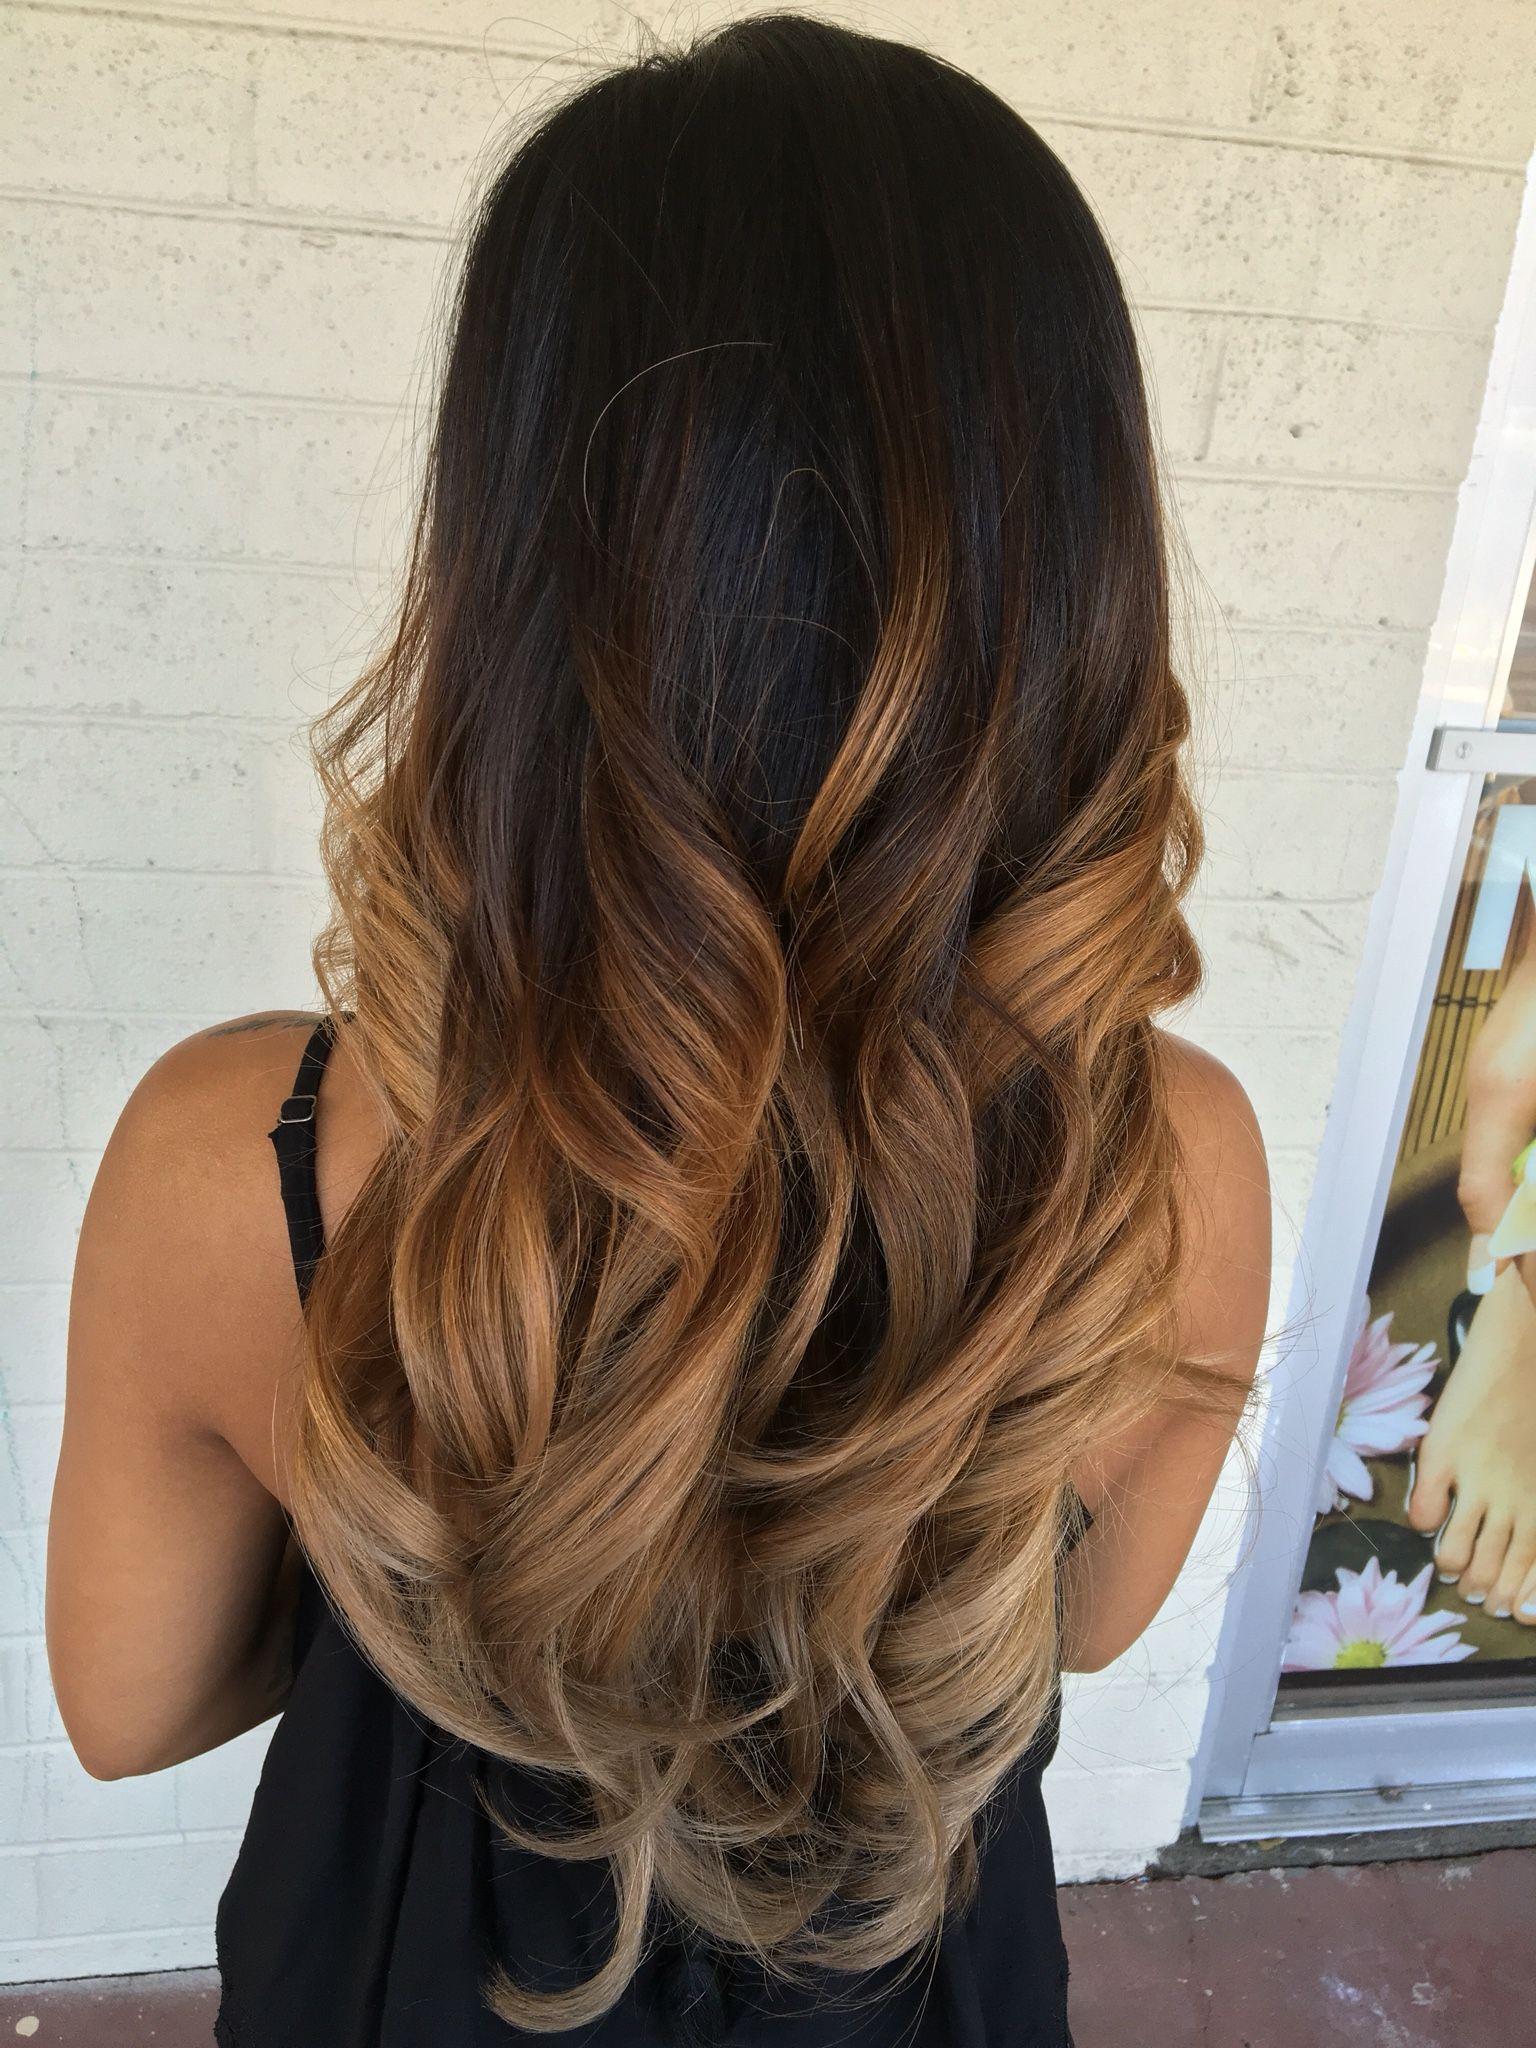 Black To Blonde Balayage Ombre Black Hair Balayage Blonde Balayage Black Hair Ombre